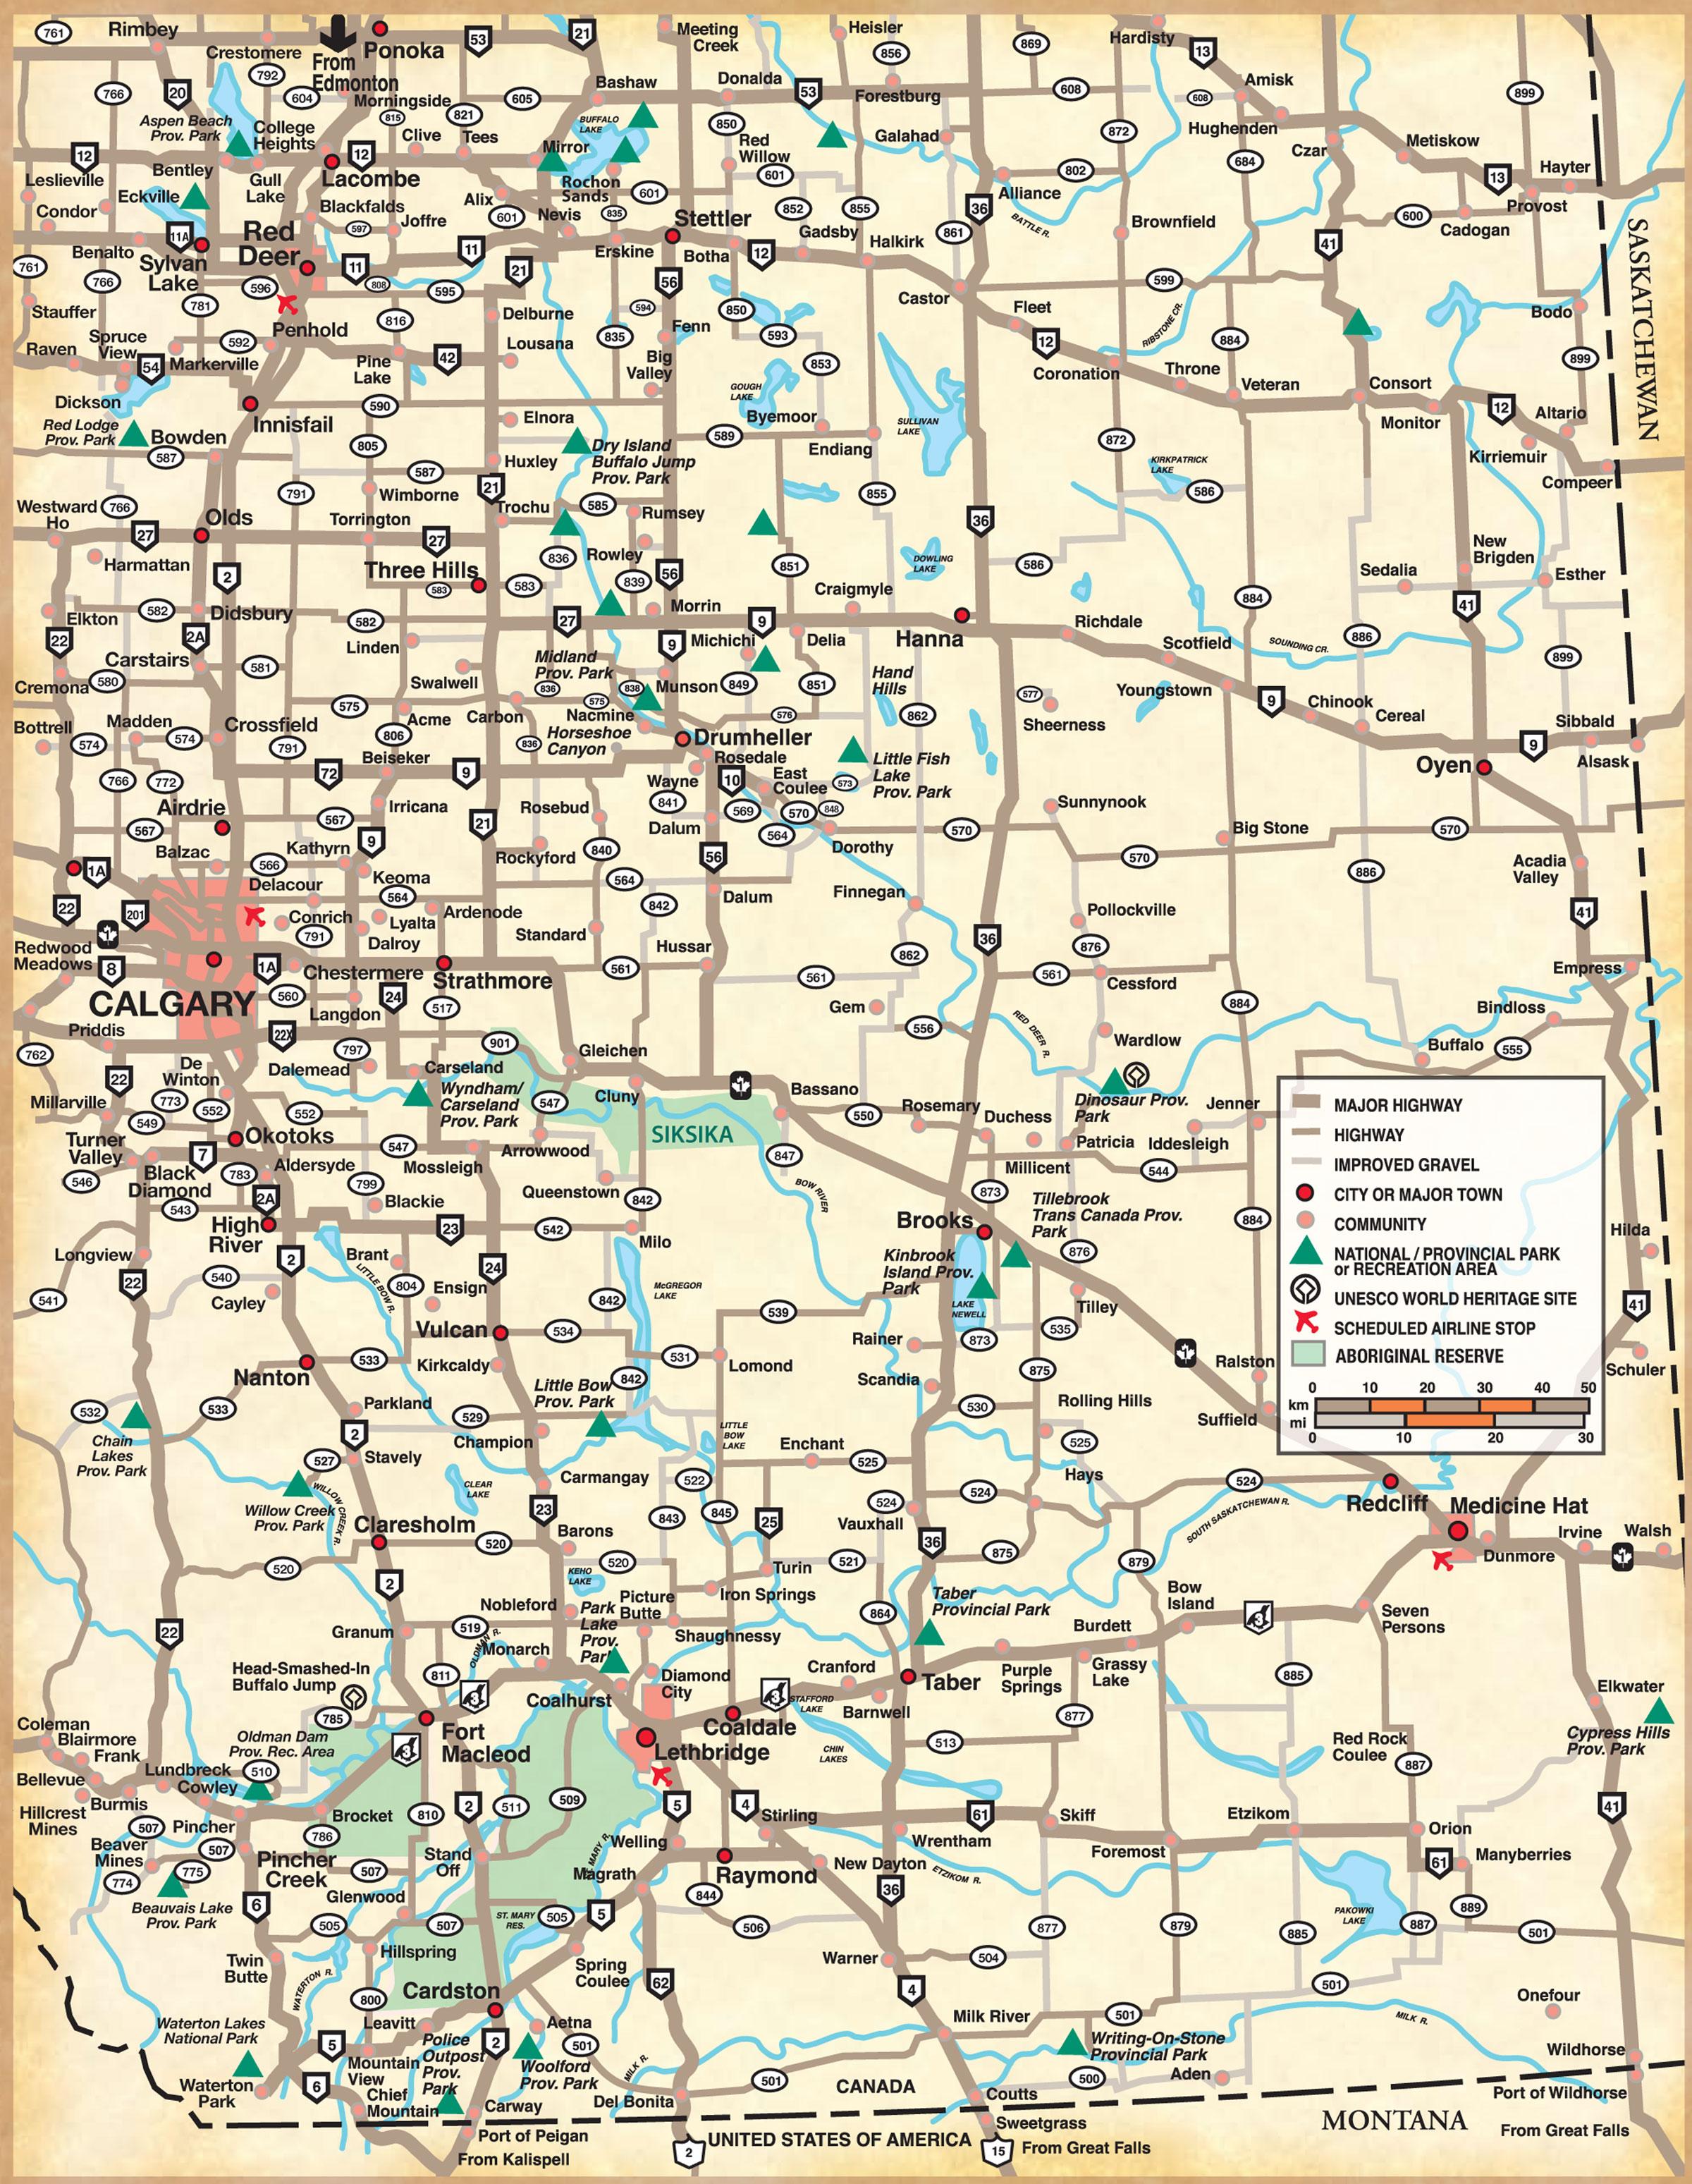 Southern Alberta Map - Countess Canada • mappery